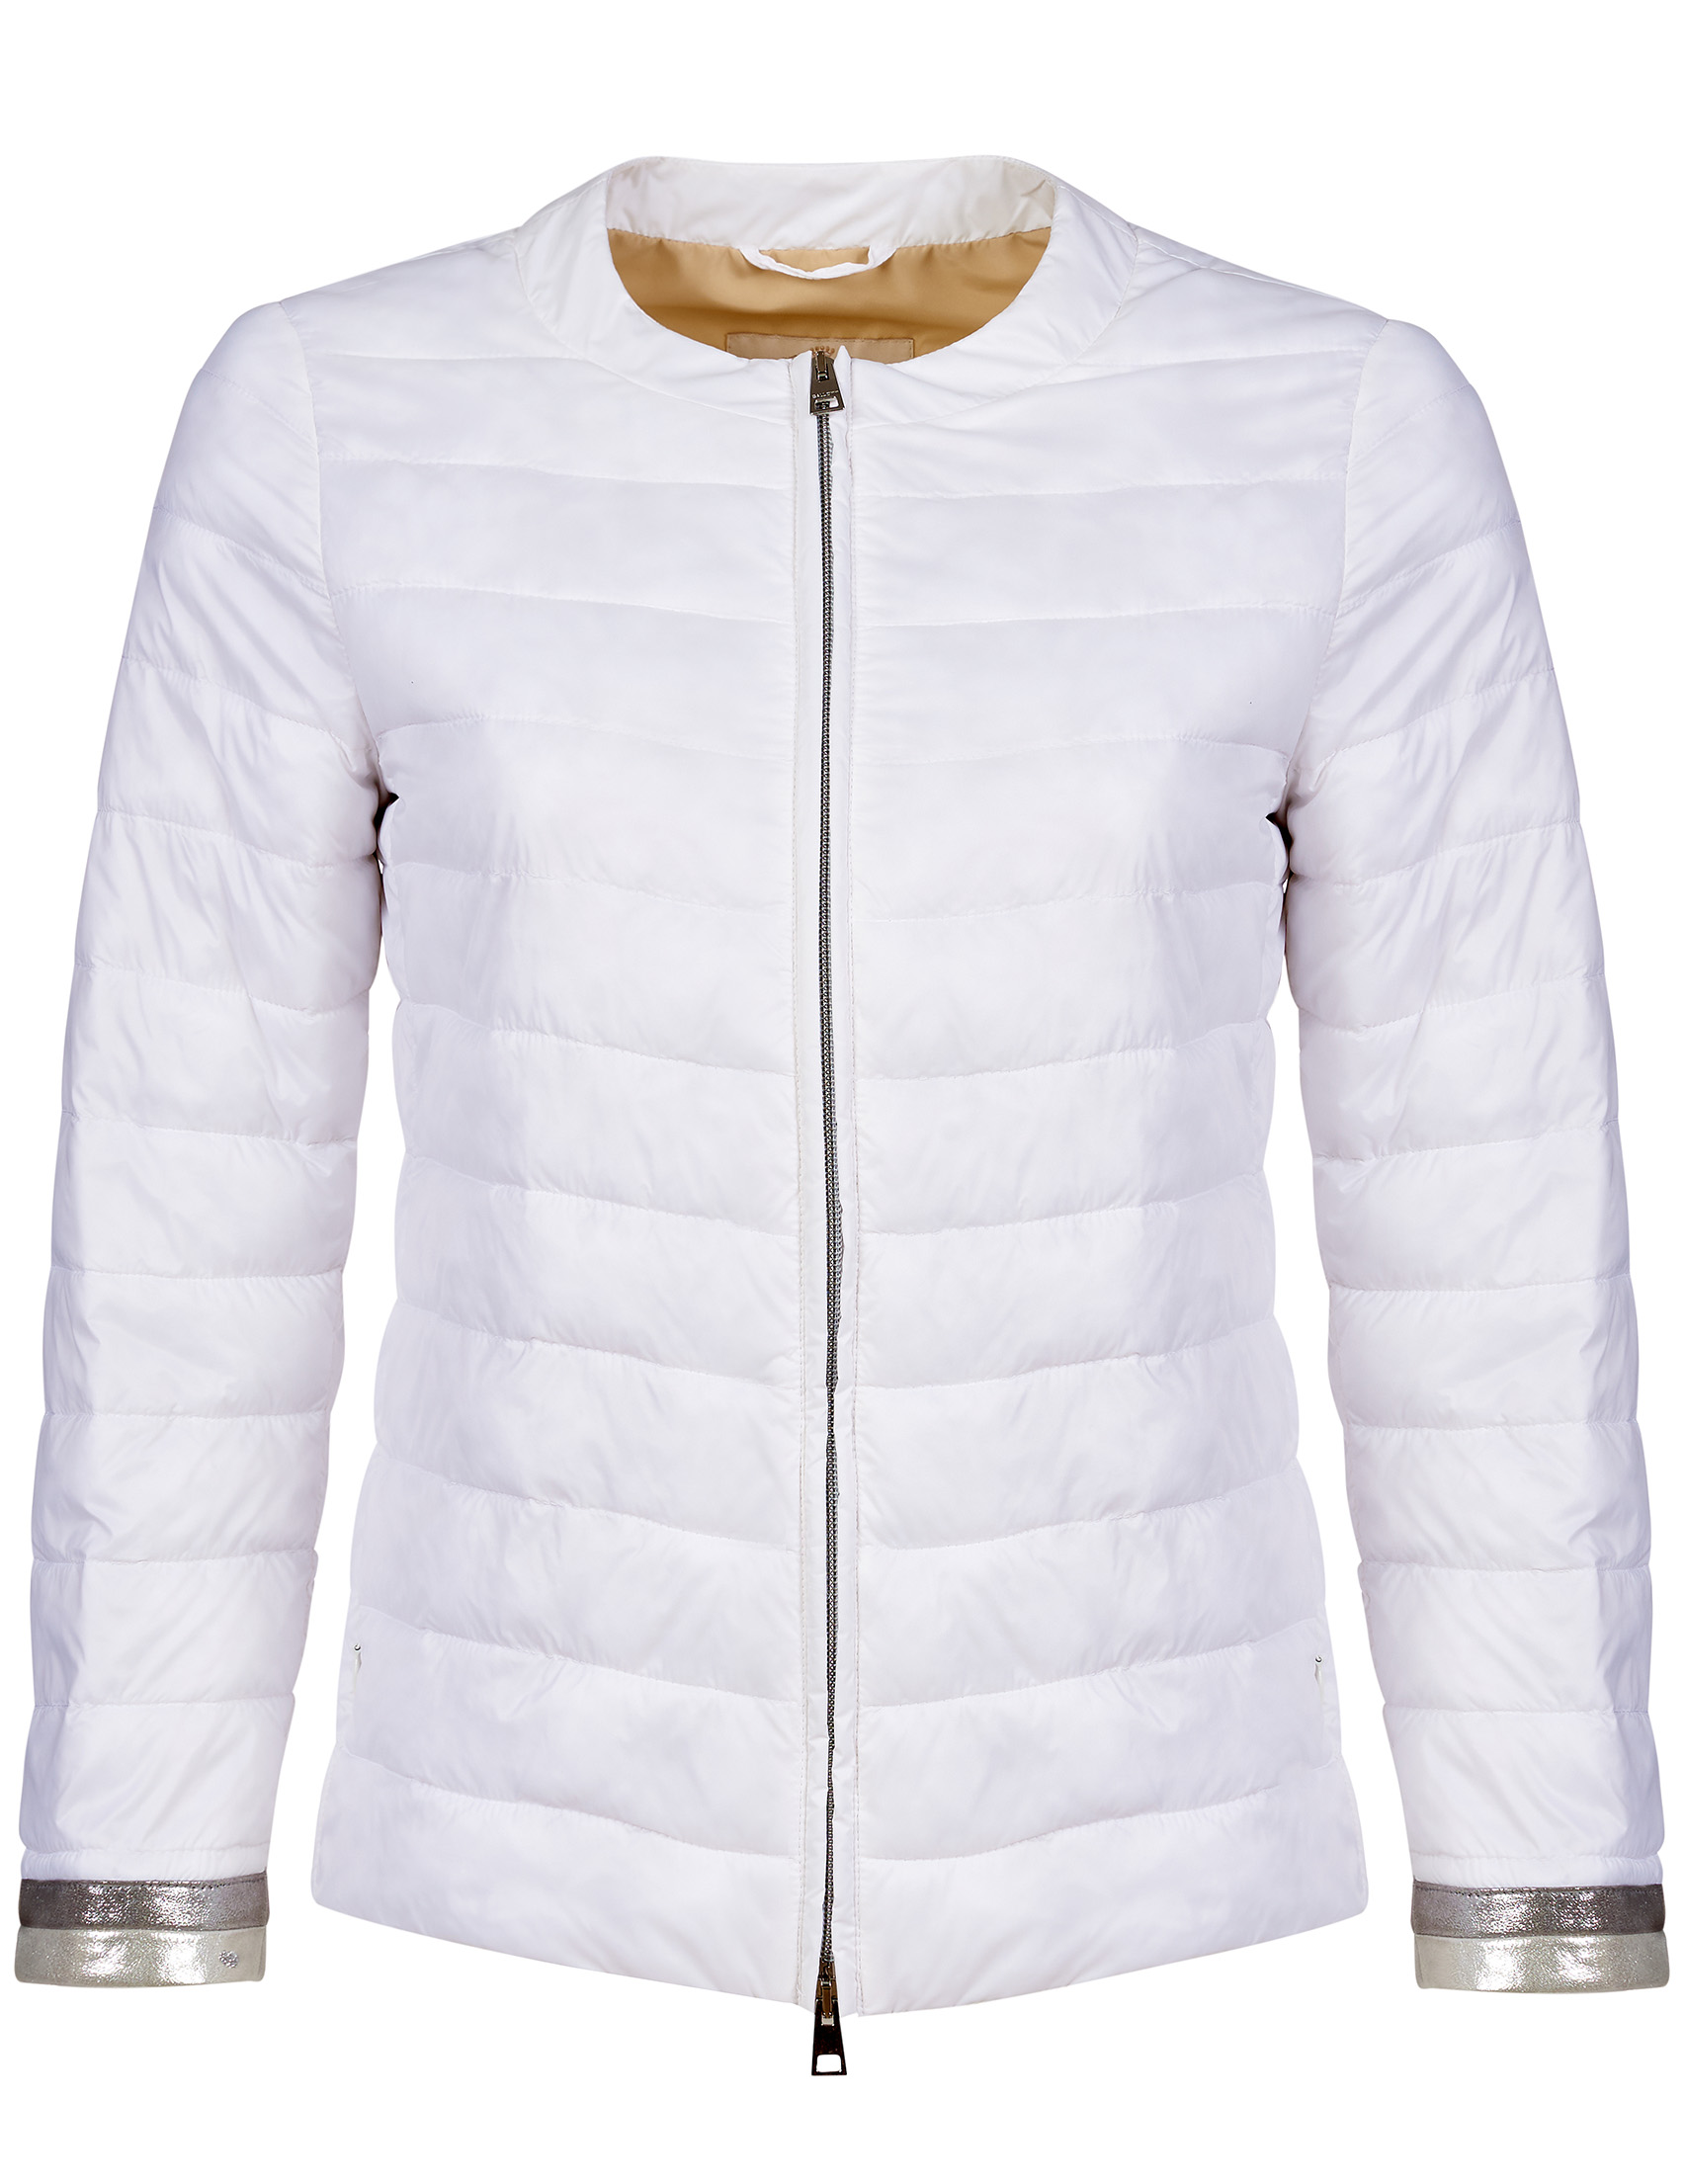 Купить Куртки, Куртка, GALLOTTI, Белый, 100%Полиэстер;80%Полиэстер 20%Шелк, Осень-Зима